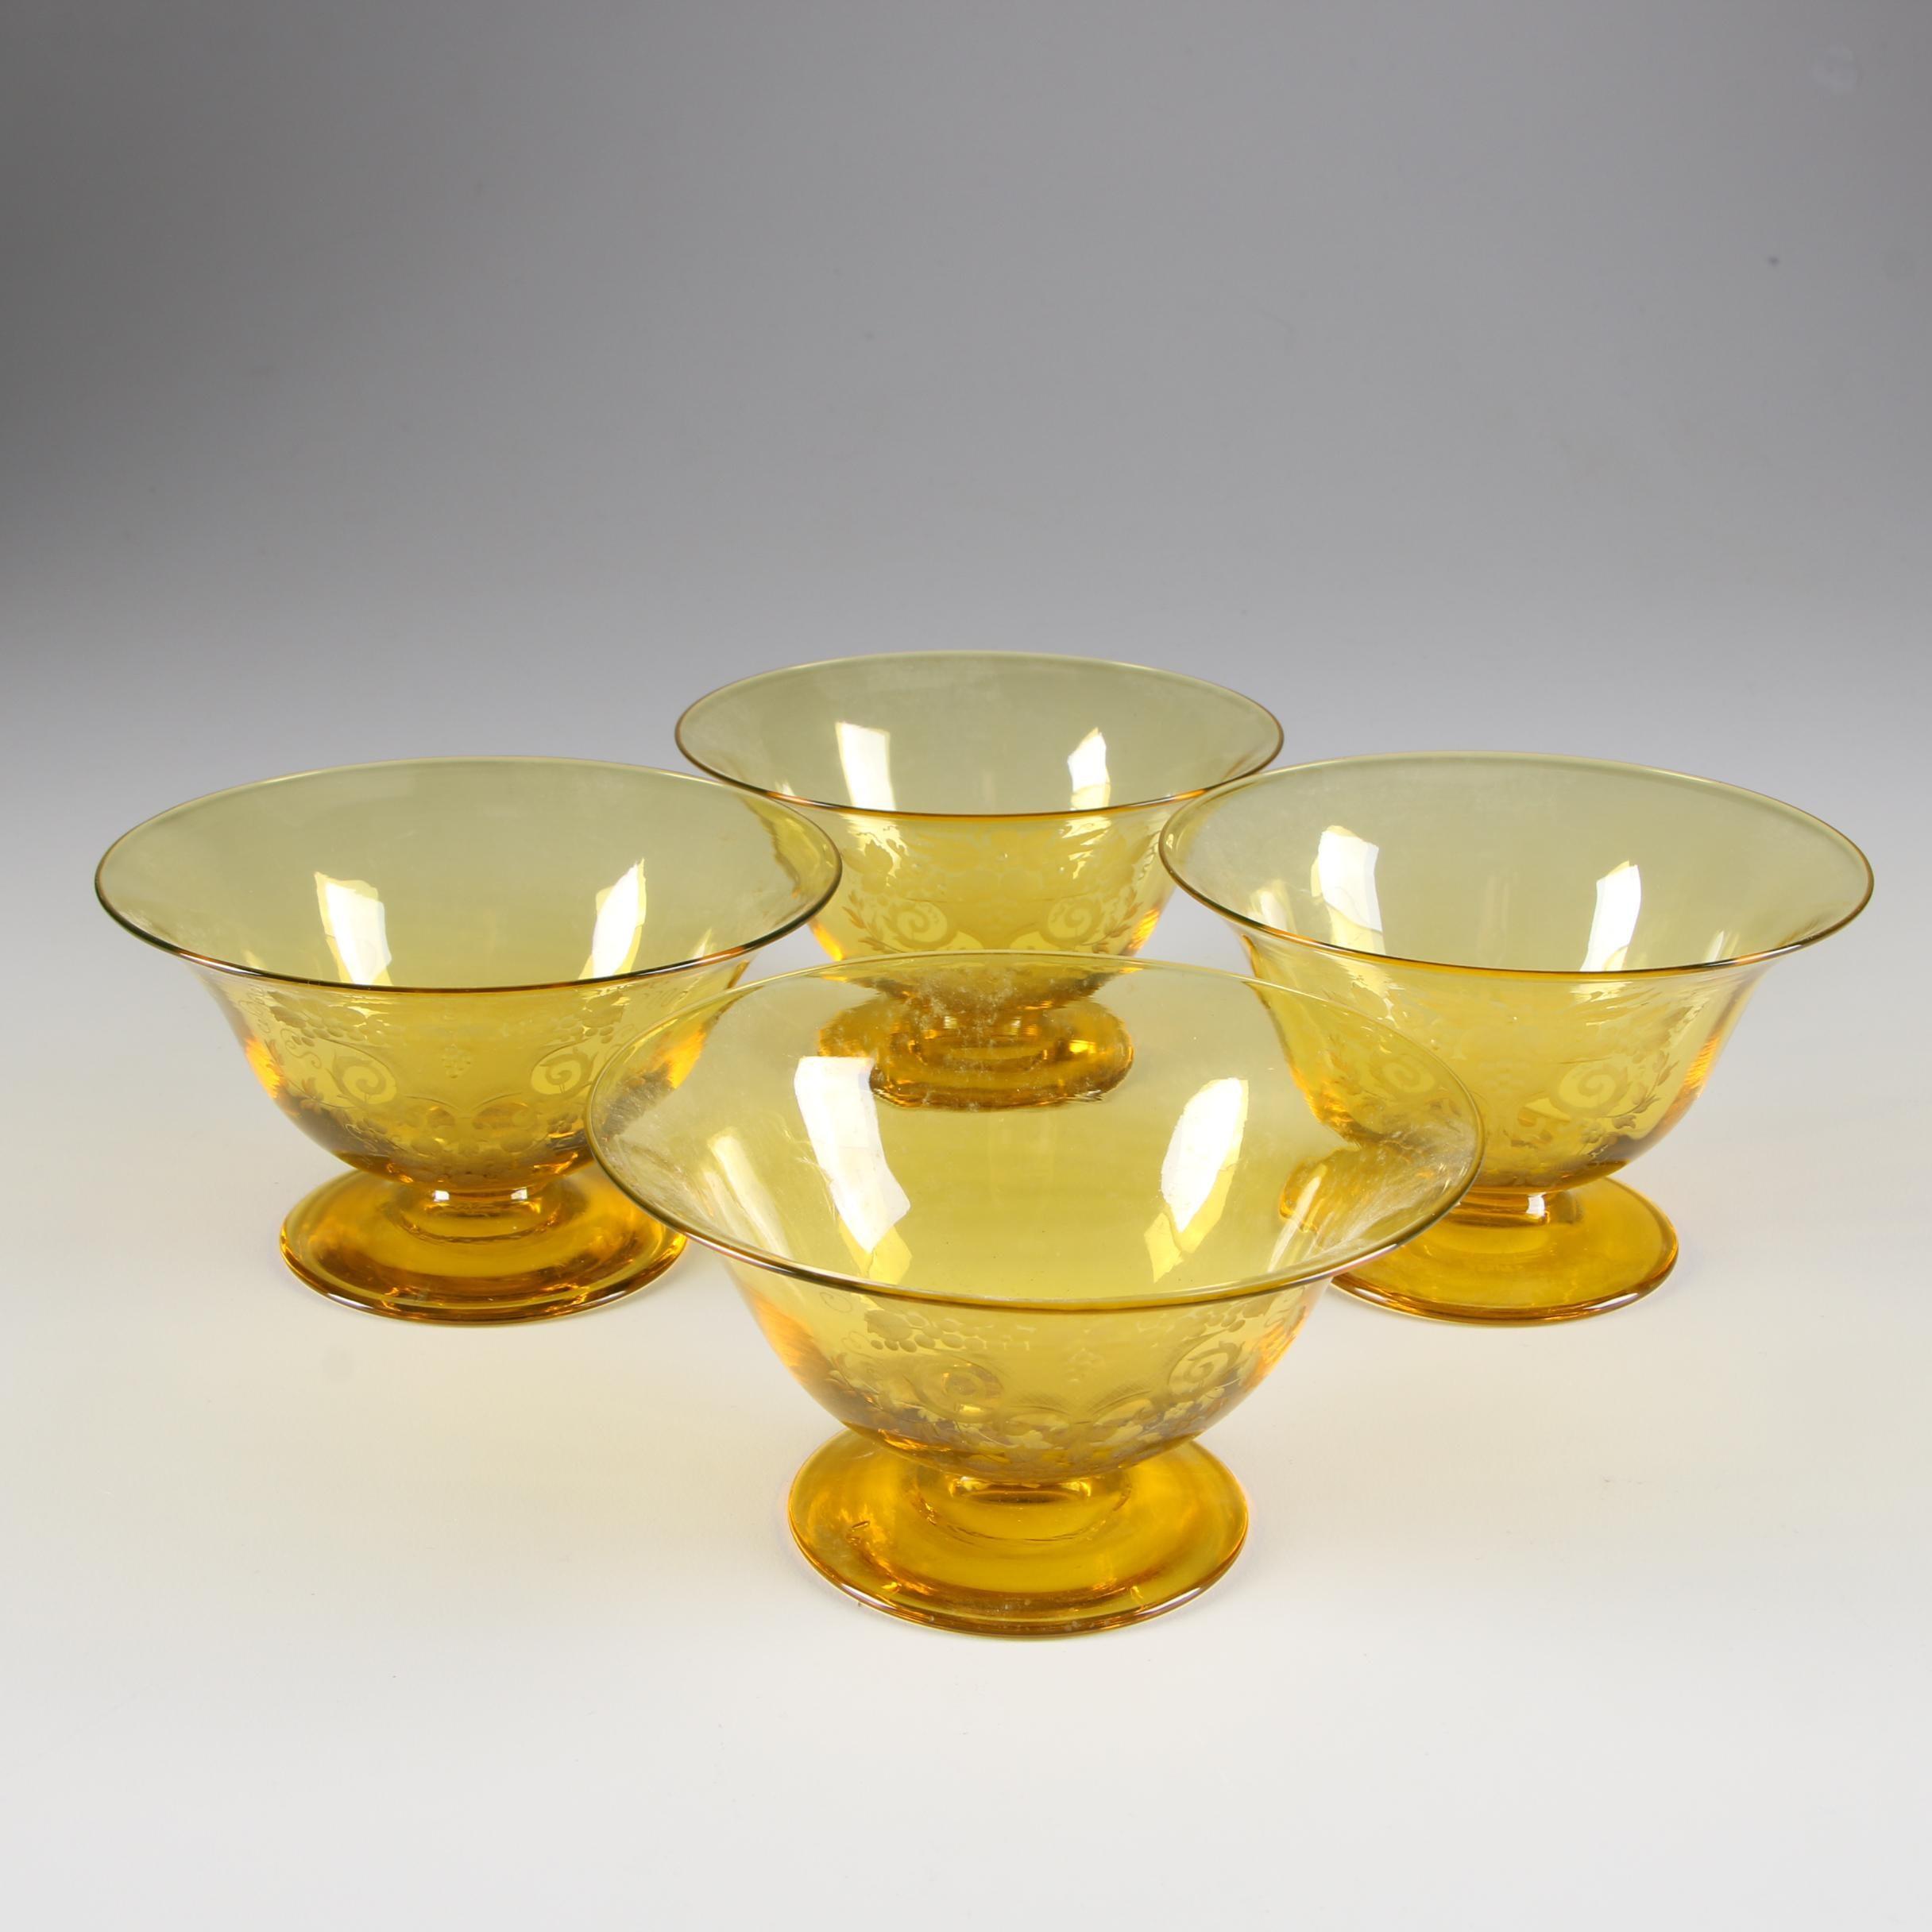 "Steuben Bristol Yellow ""Autumn"" Engraved Art Glass Sherbets, Early 20th Century"